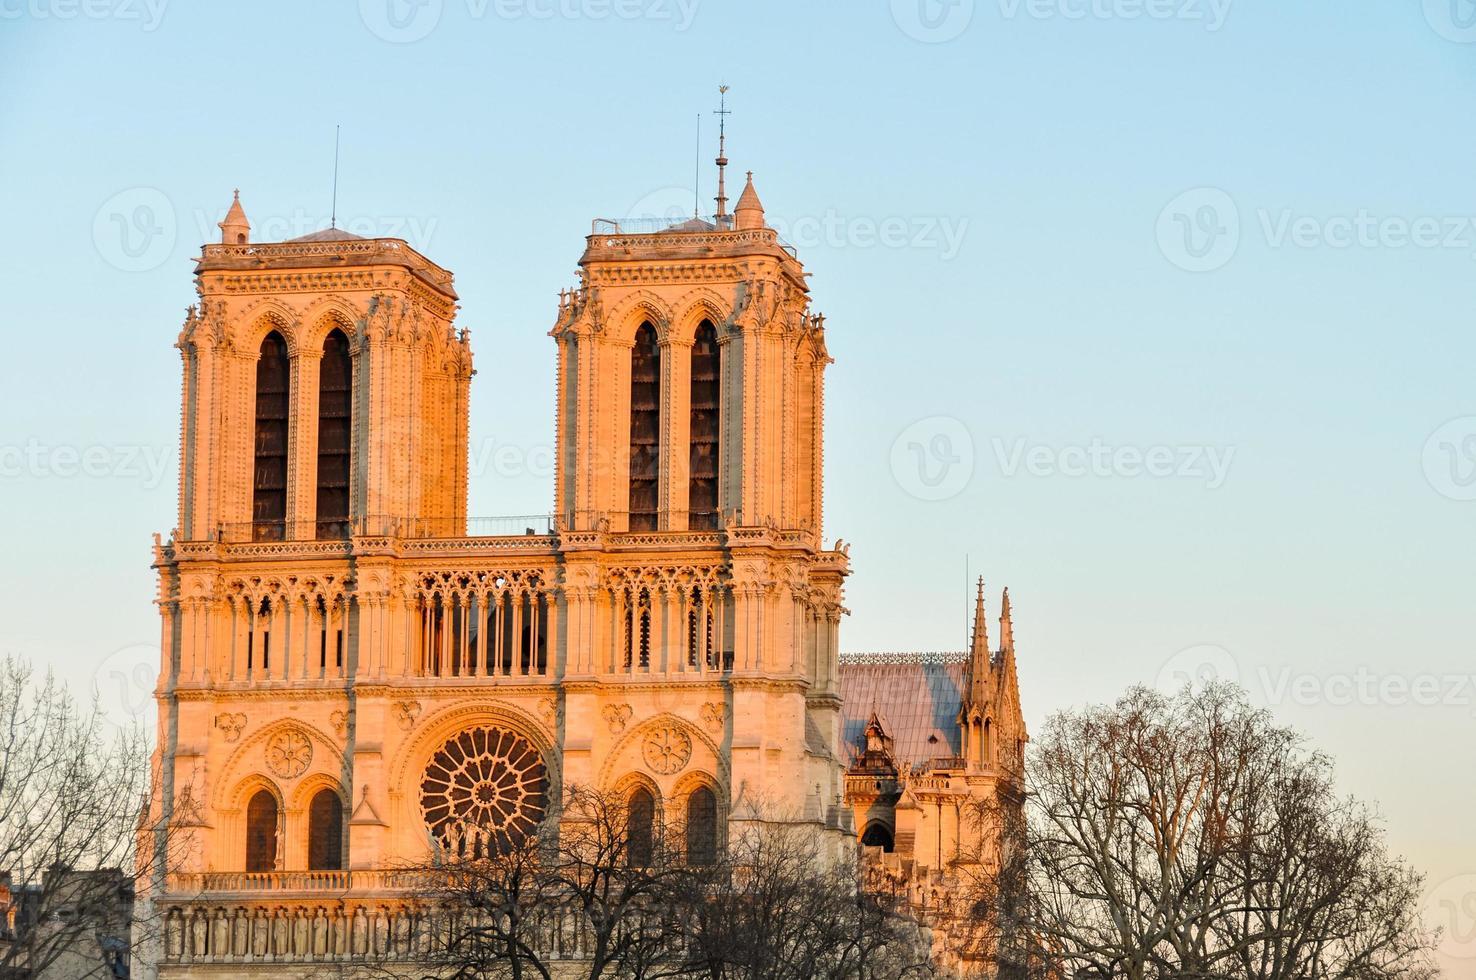 Notre-Dame de Paris kathedraal bij zonsondergang foto